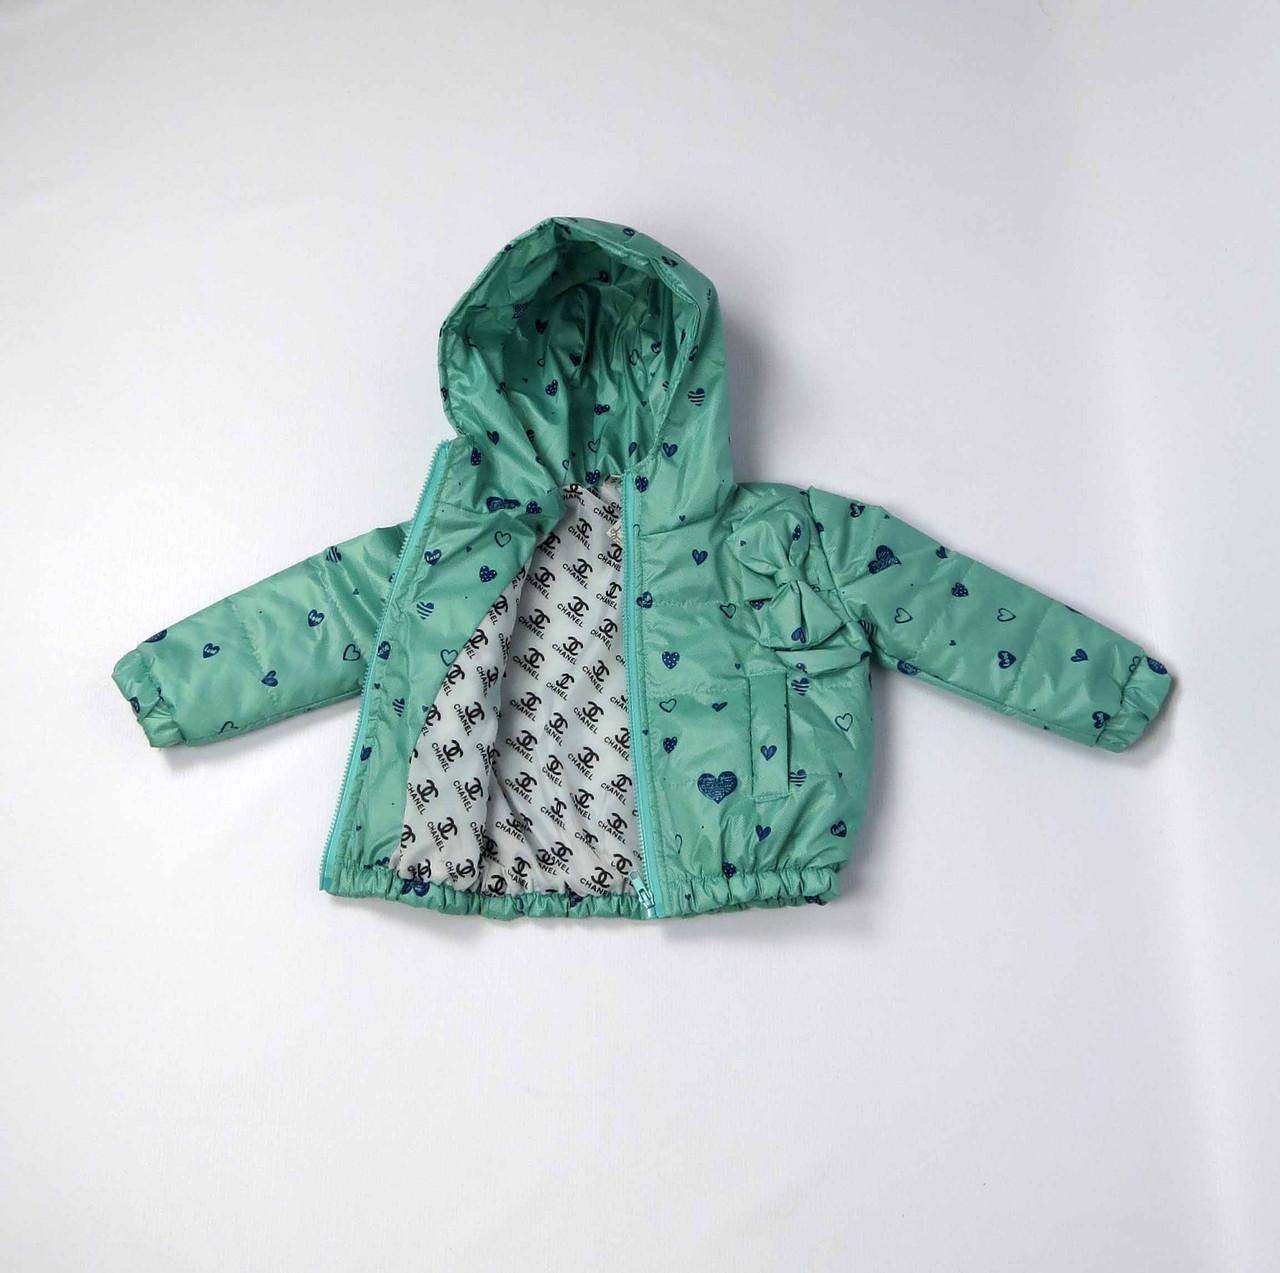 Куртка весна осень беби  код 106 размер 86-104 (1-4 лет) цвет бирюза, фото 3